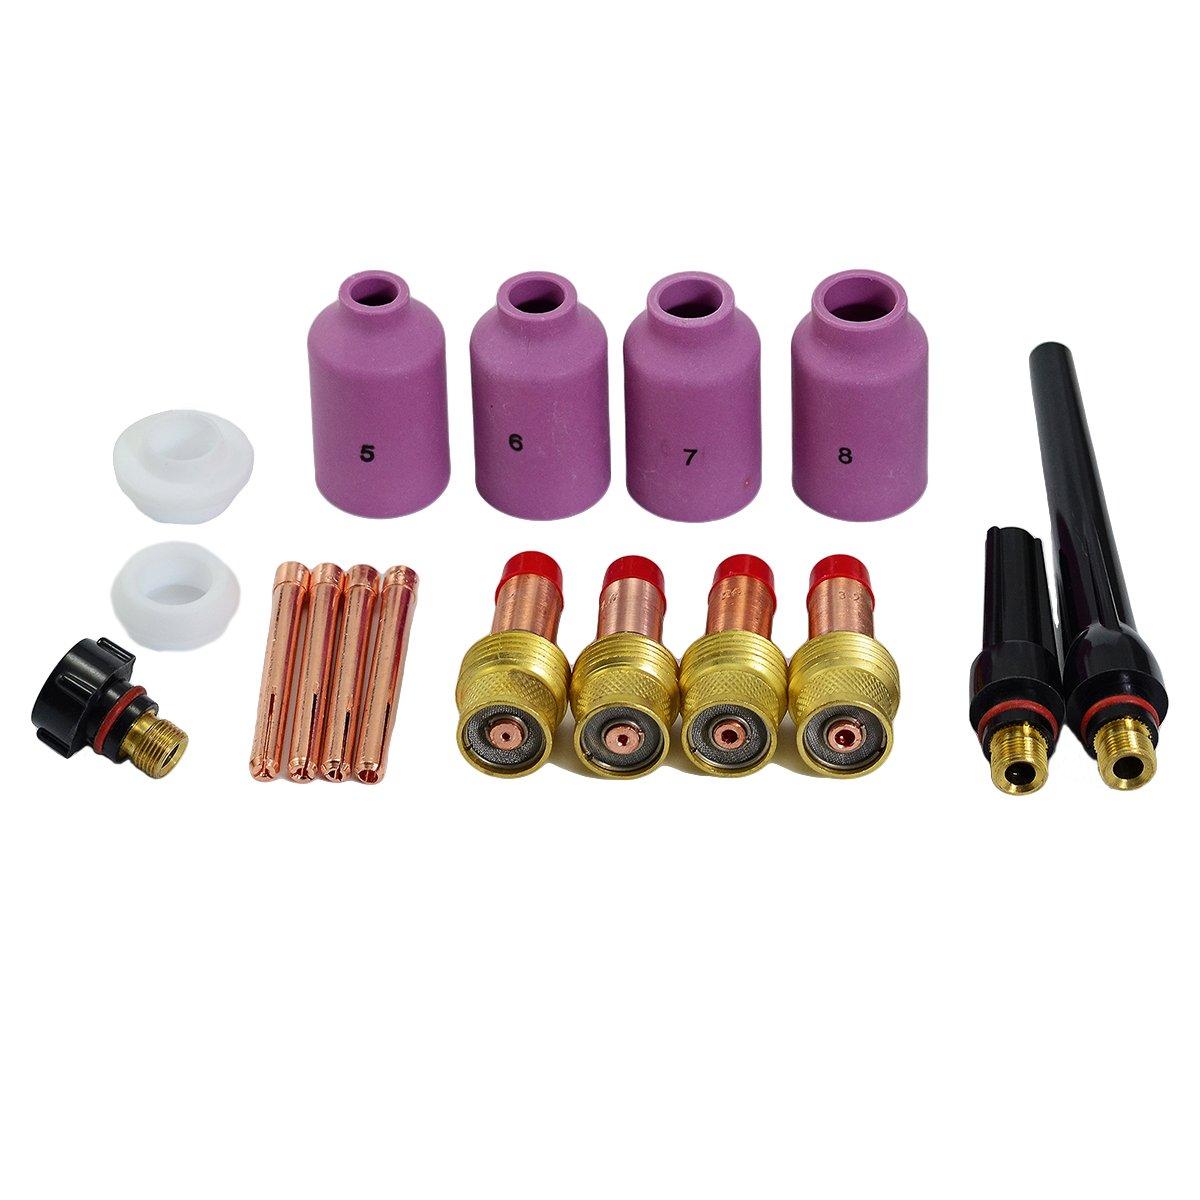 TIG Gas Lens Nozzle Collet Body Back Cap Kit Fit SR WP17 18 26 TIG Welding Torch Accessories Consumables 17pcs